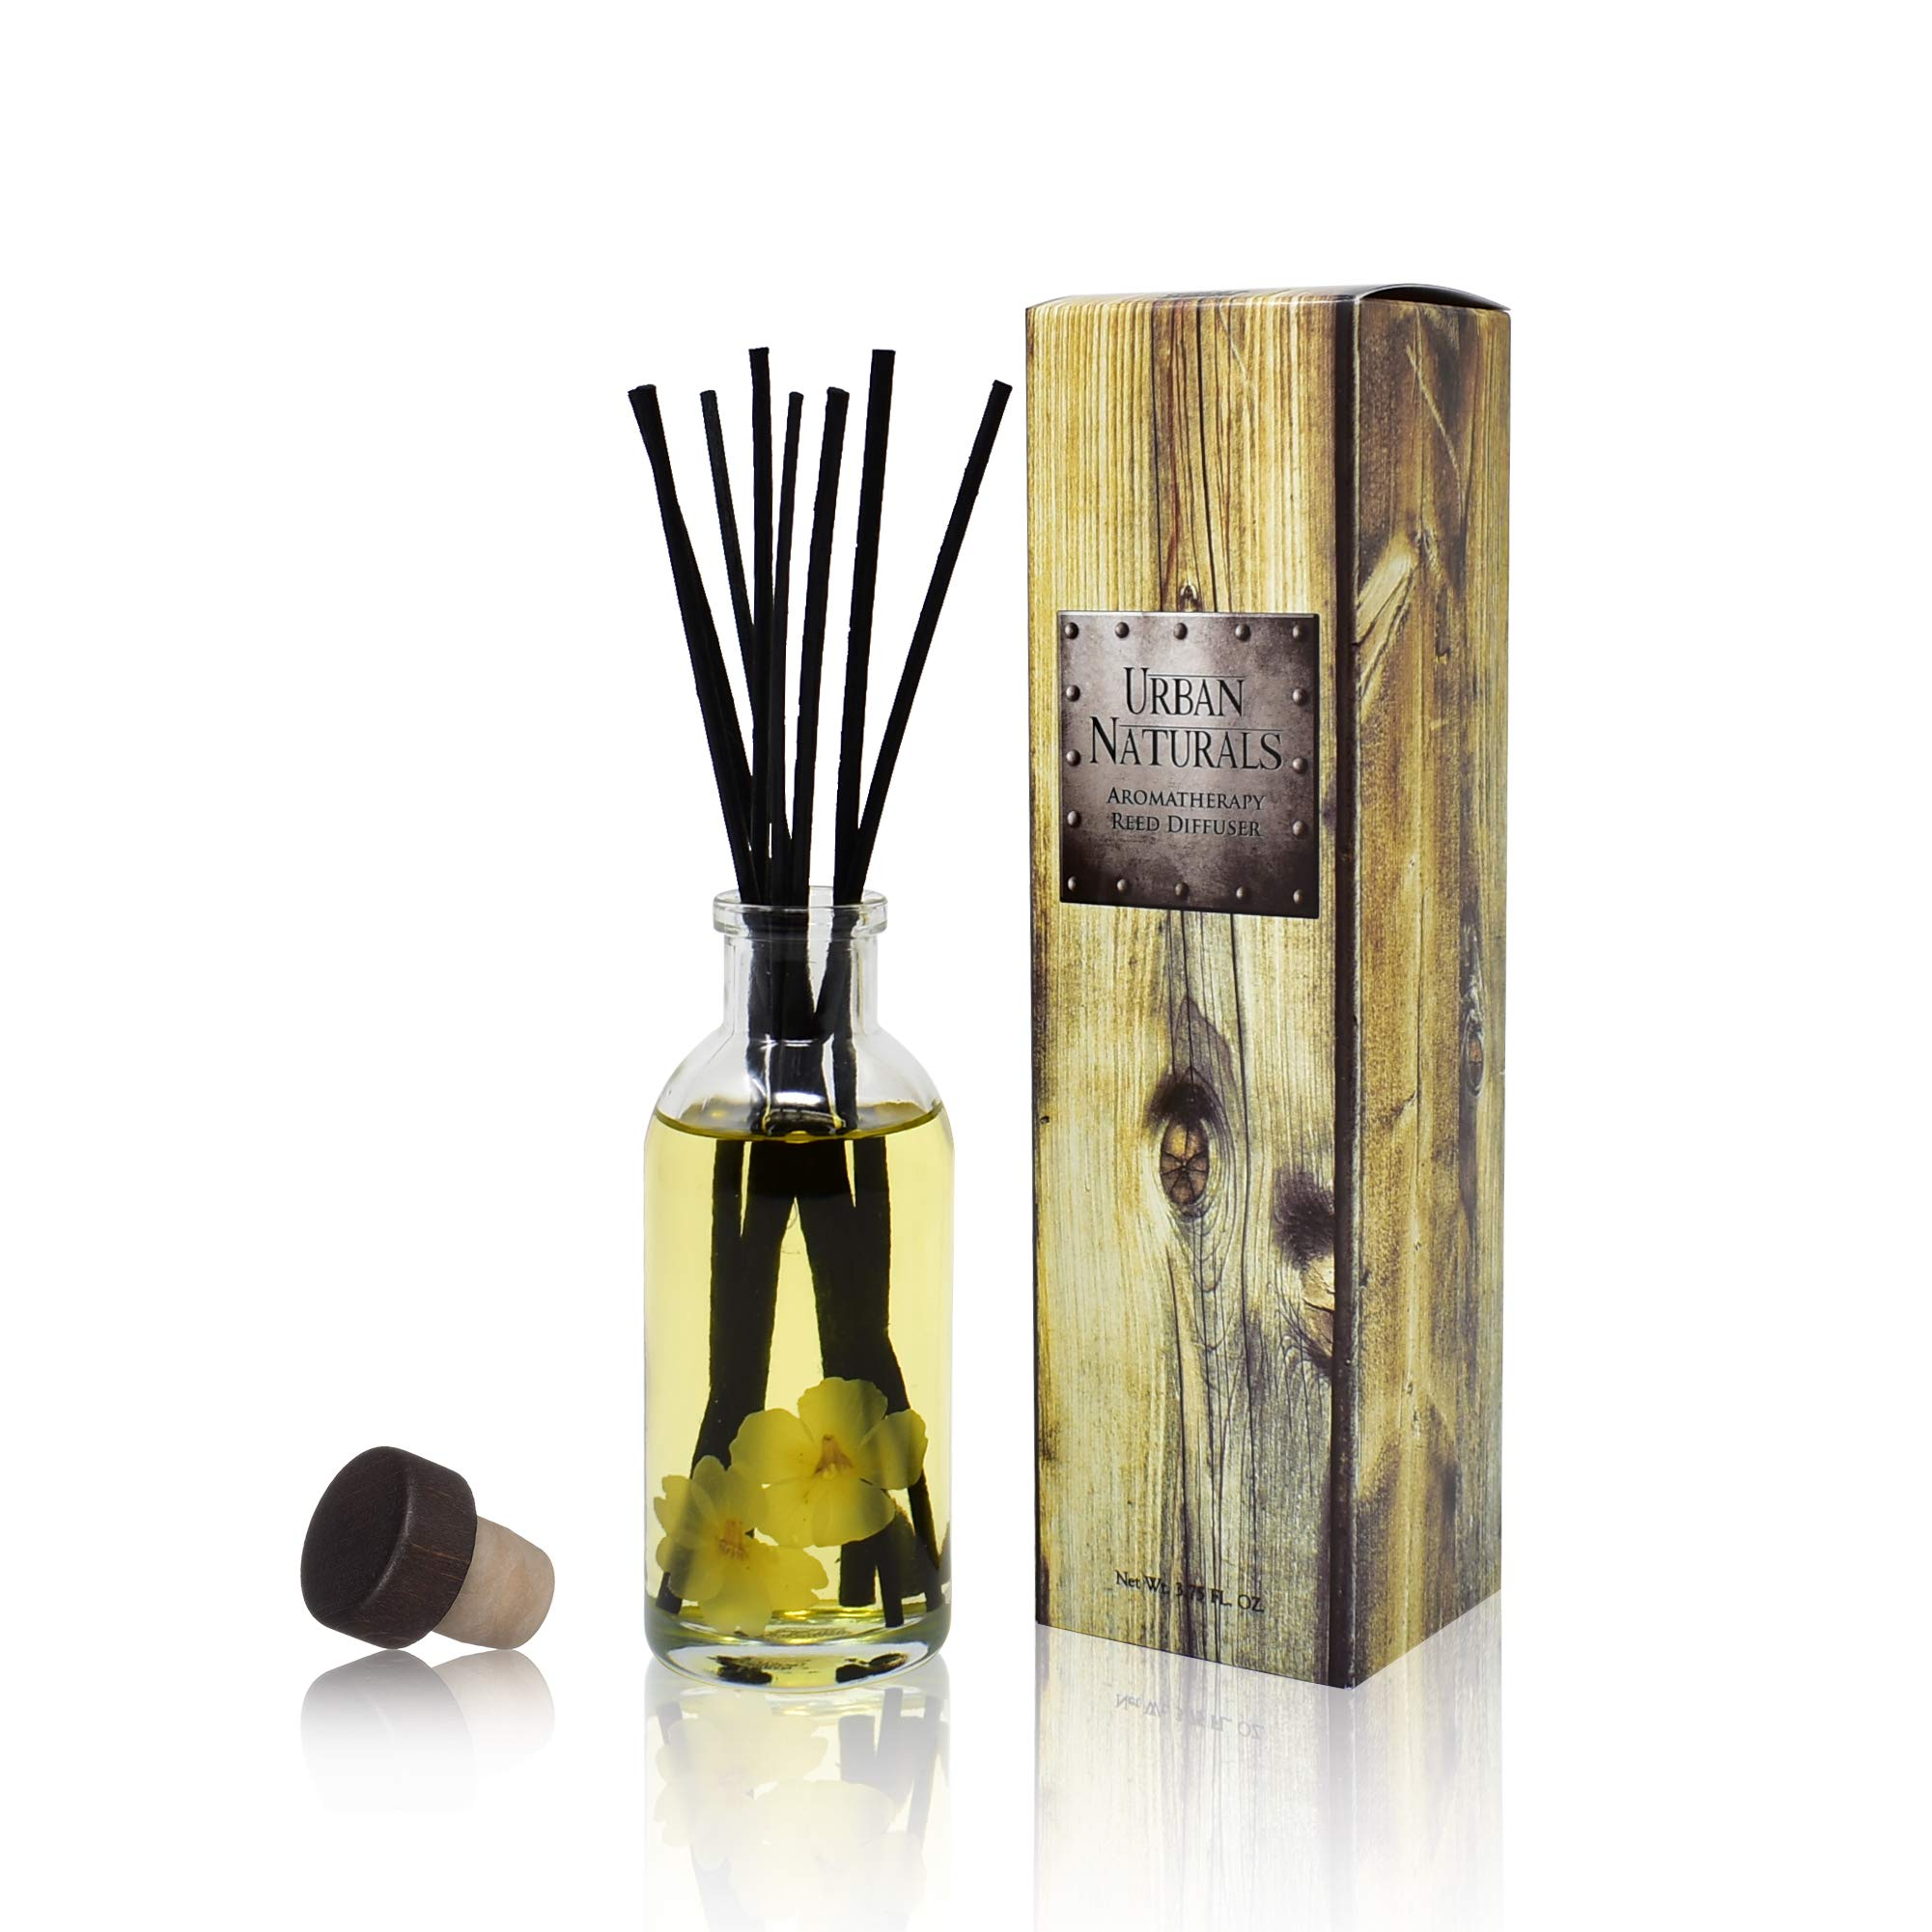 Urban Naturals Citrus & Jasmine Reed Diffuser Scented Sticks Set | (Energy + Clarity) Mind & Body Aromatherapy Collection | Essential Oil Botanical Room Scent | Liquid Potpourri Alternative